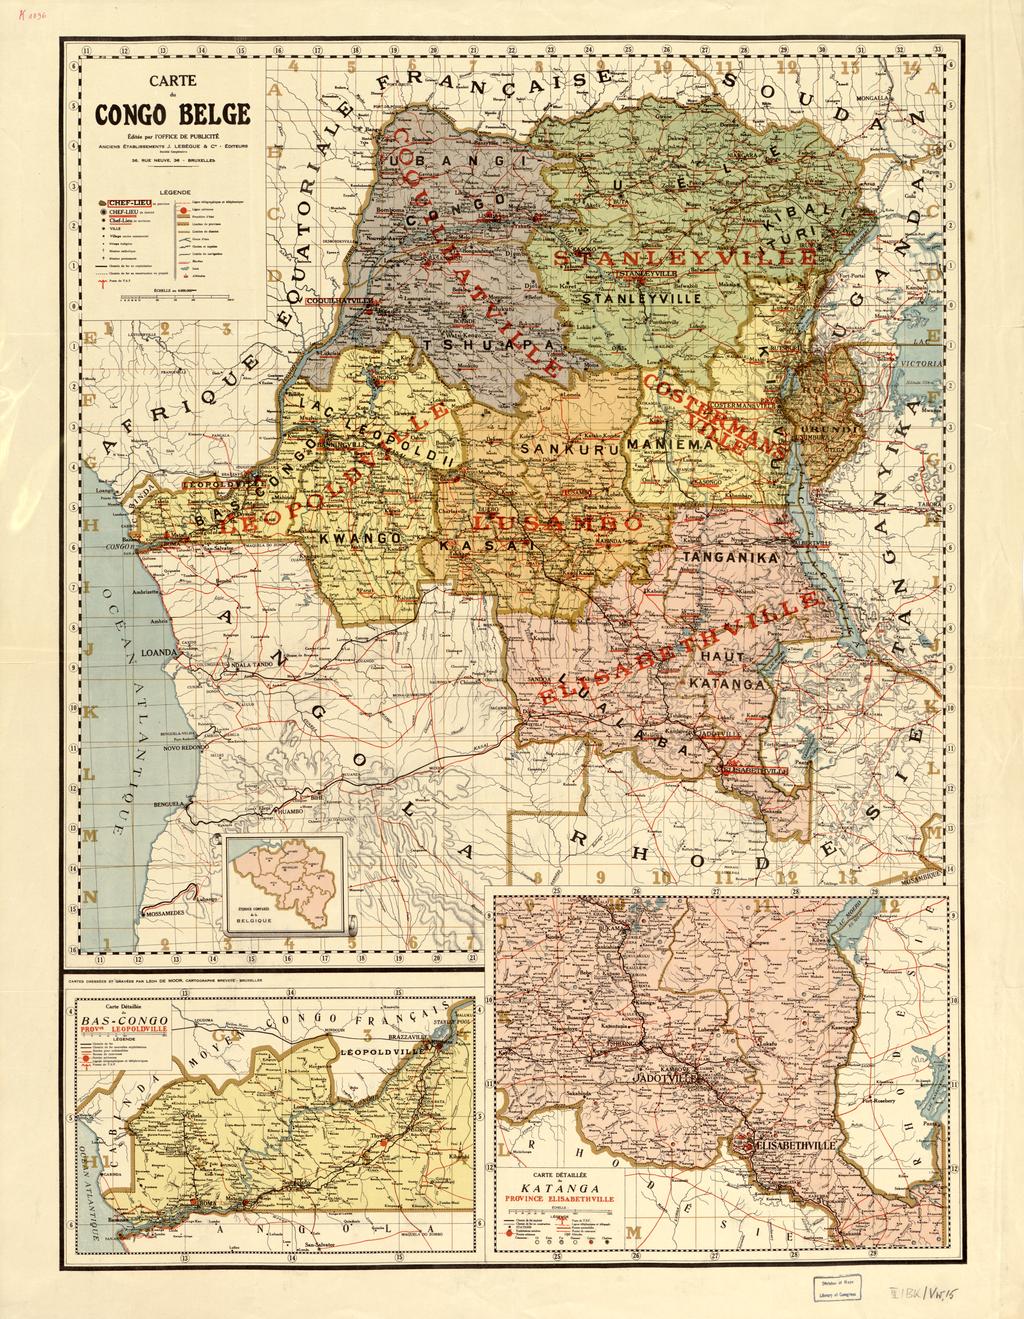 congo imperialism by belgium